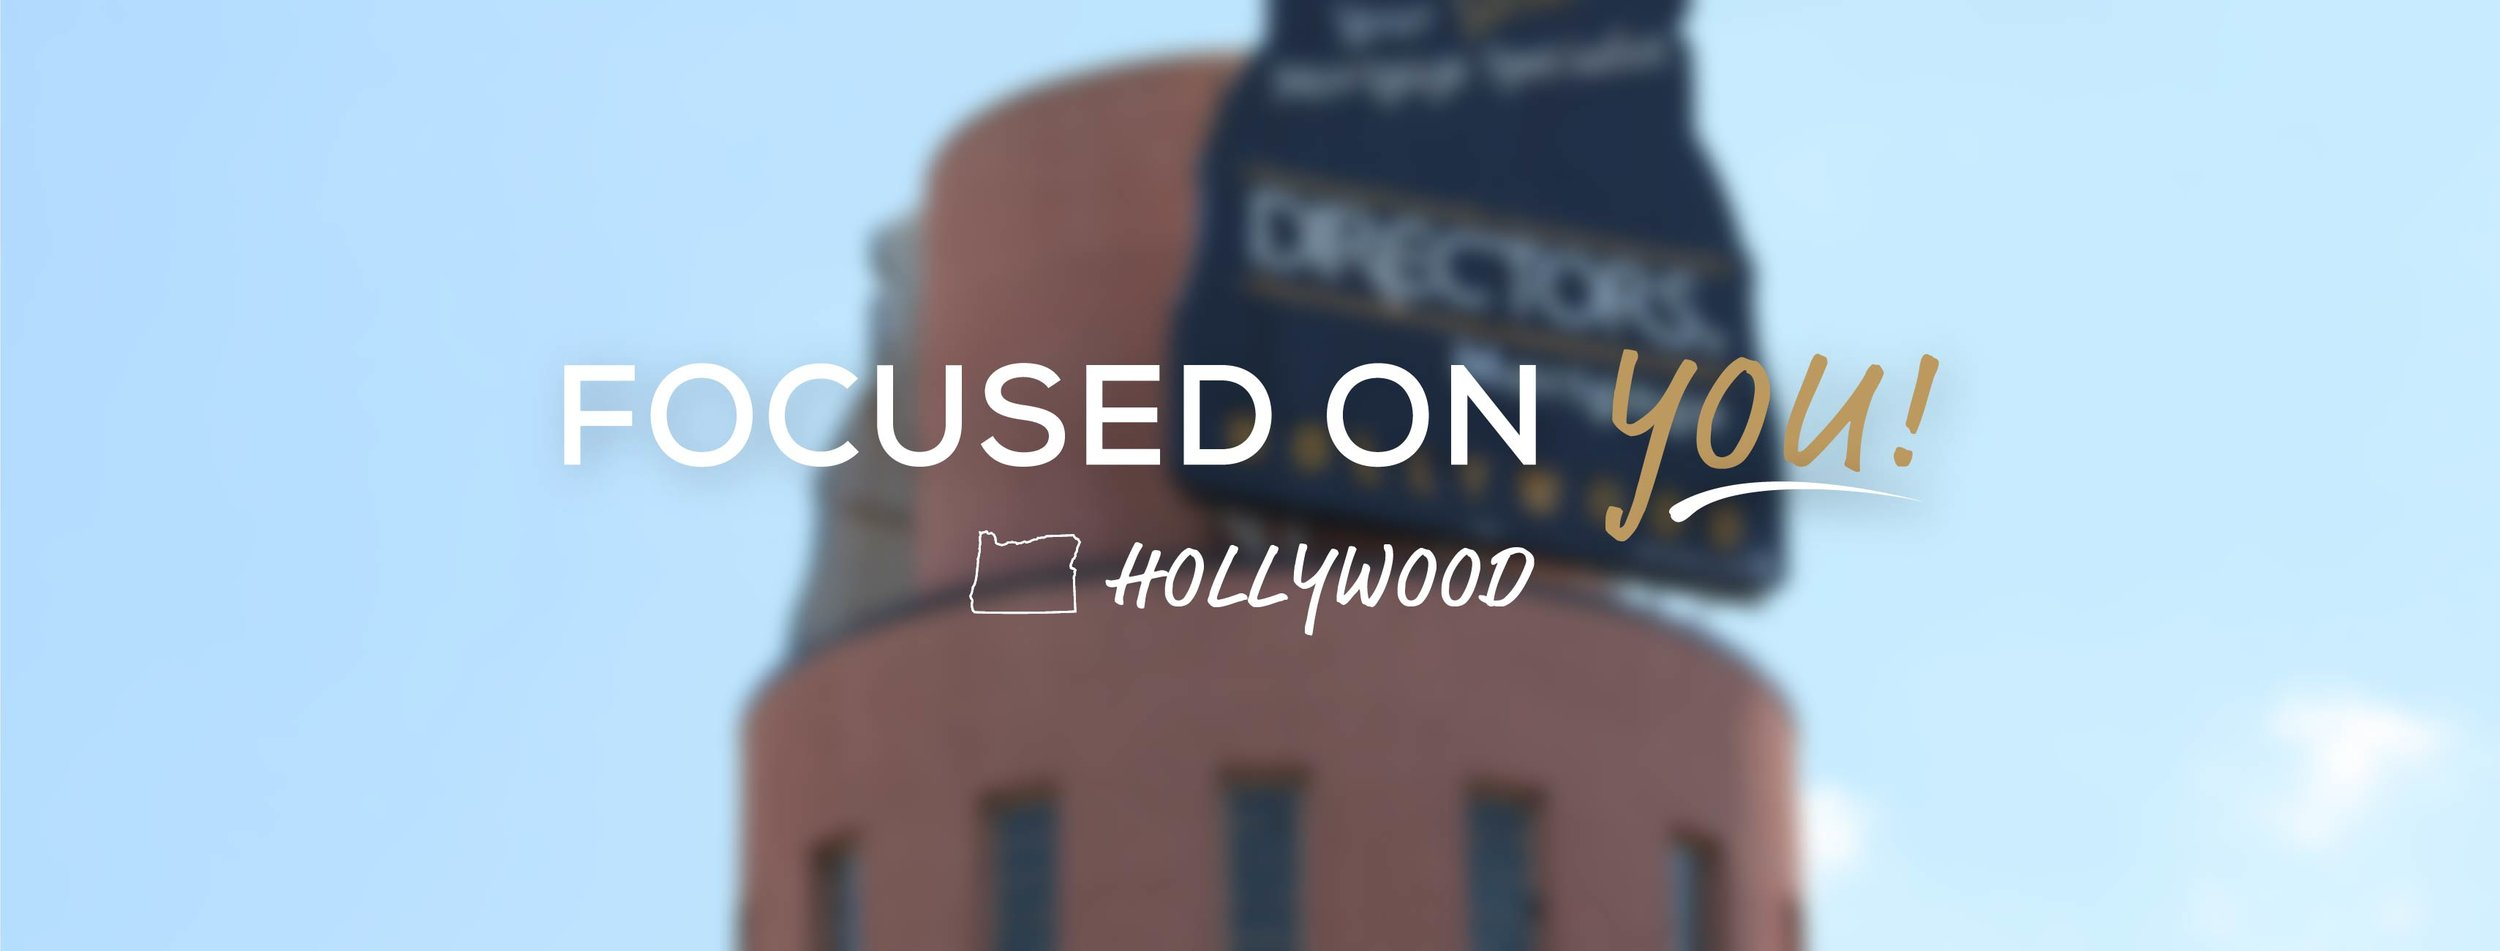 Hollywood - 503.894.5570hollywood@directorsmortgage.net3636 NE BroadwayPortland, OR 97232Street